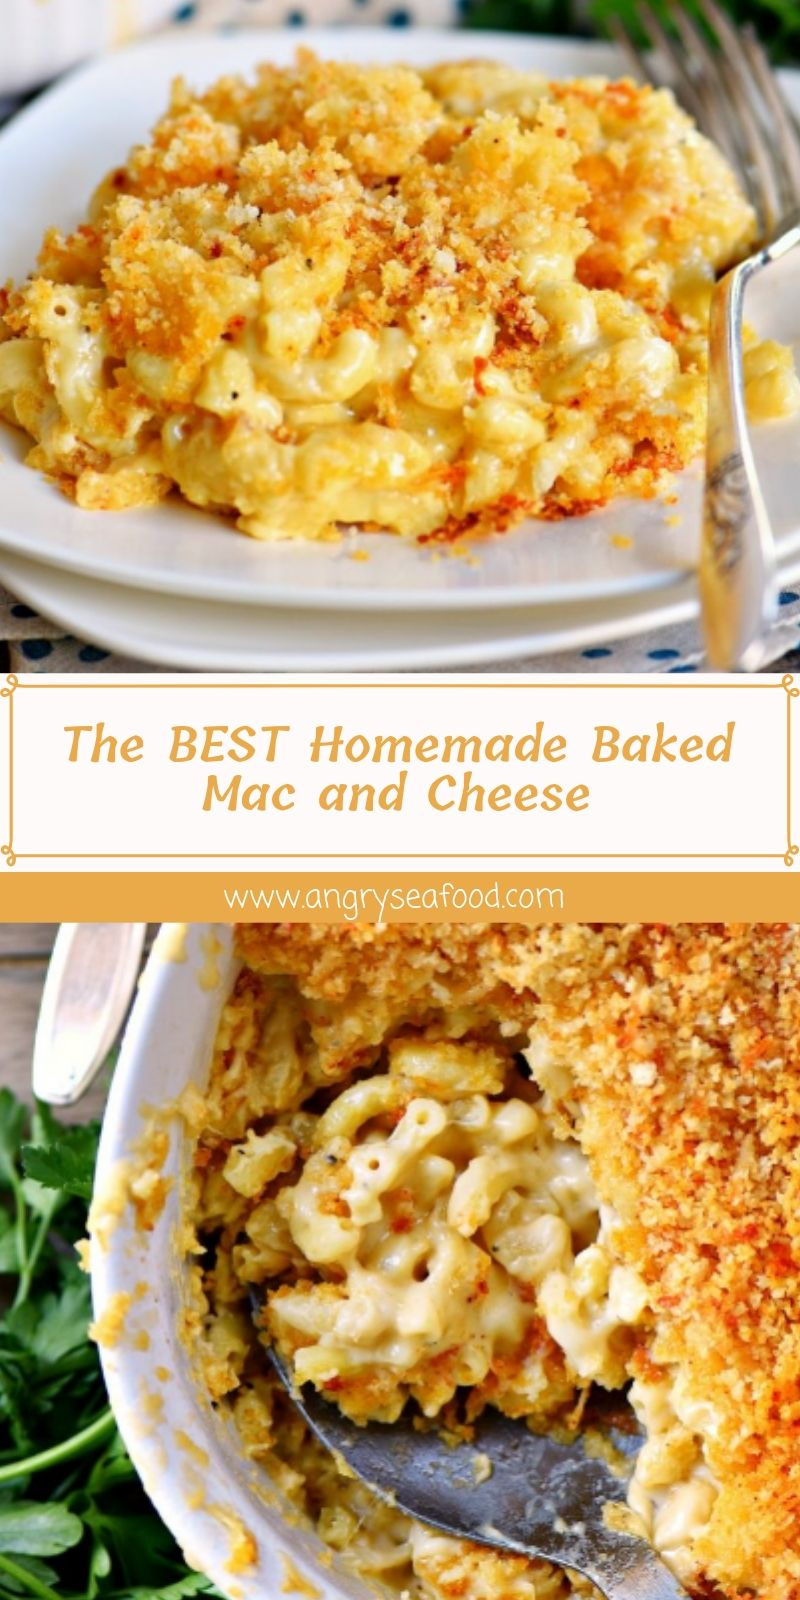 The BEST Homemade Baked Mac and Cheese #macandcheeserecipe